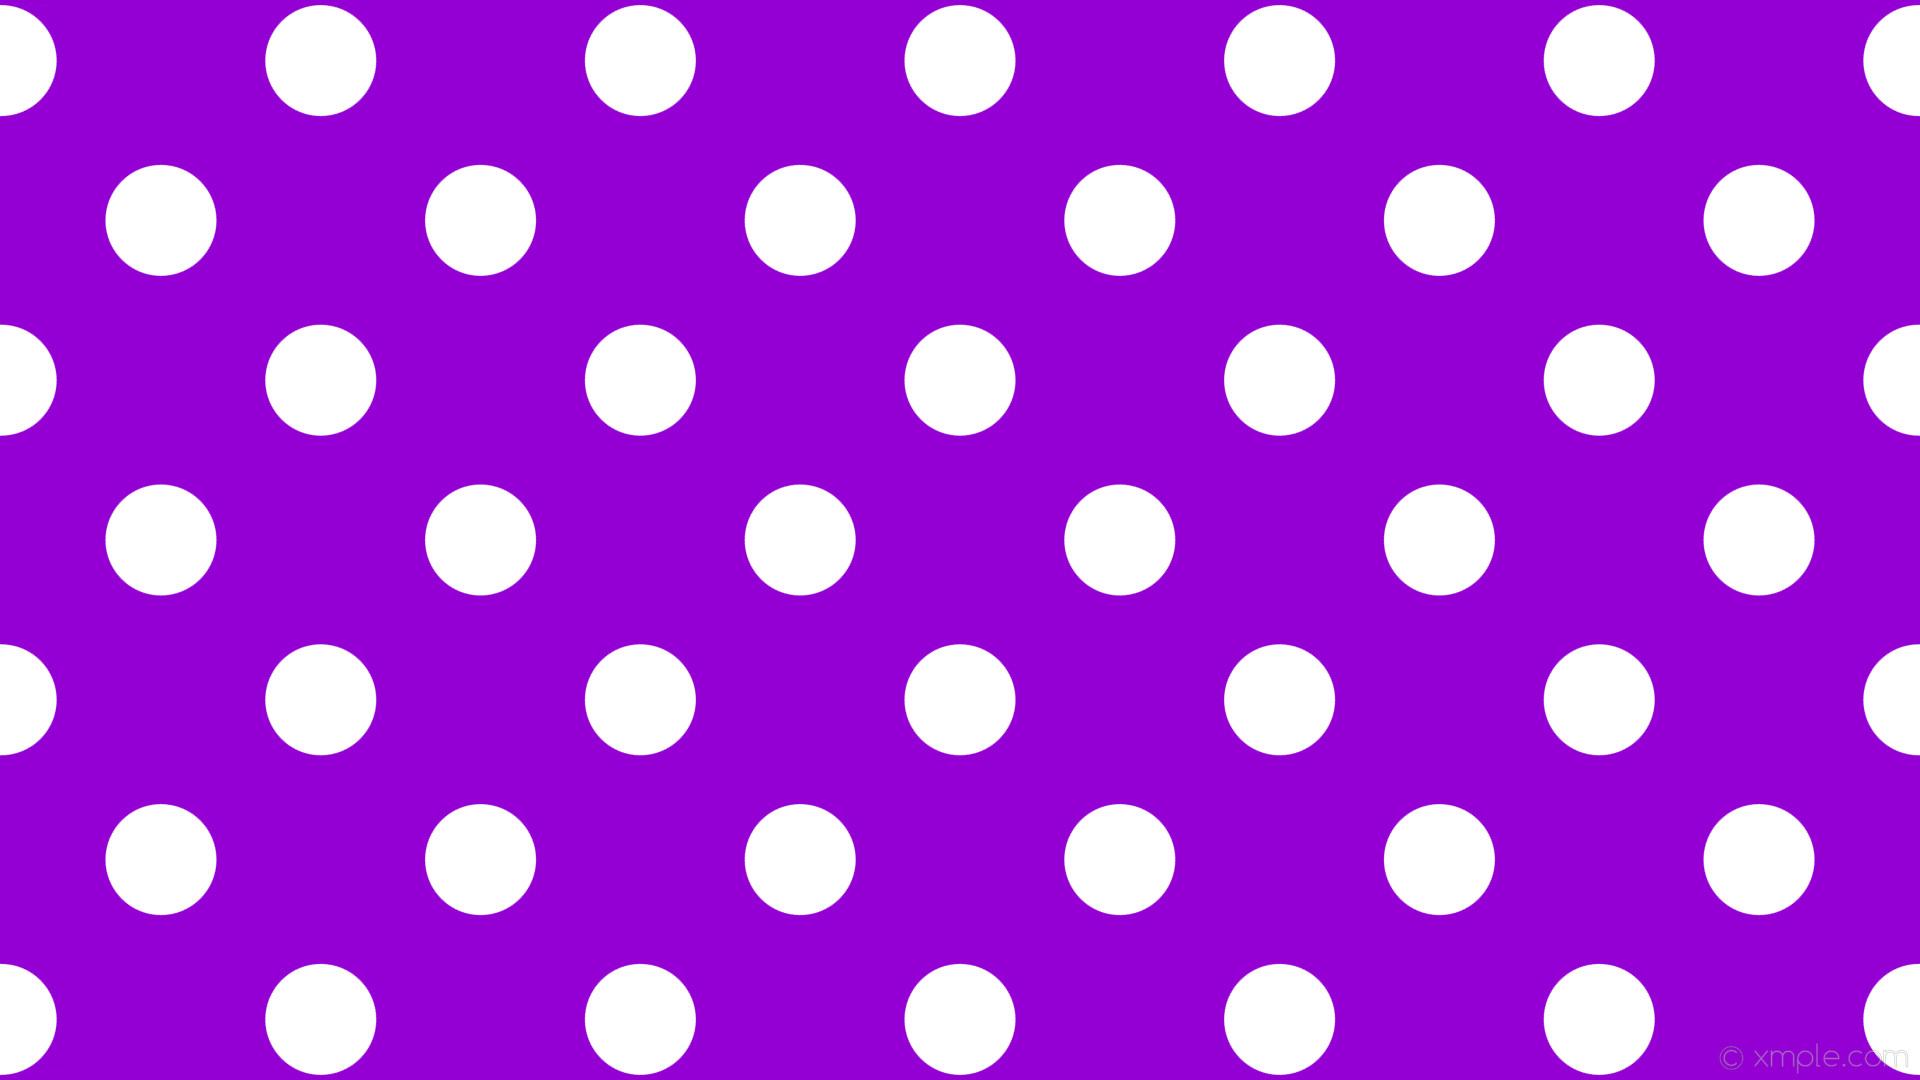 wallpaper white spots purple polka dots dark violet #9400d3 #ffffff 45°  111px 226px